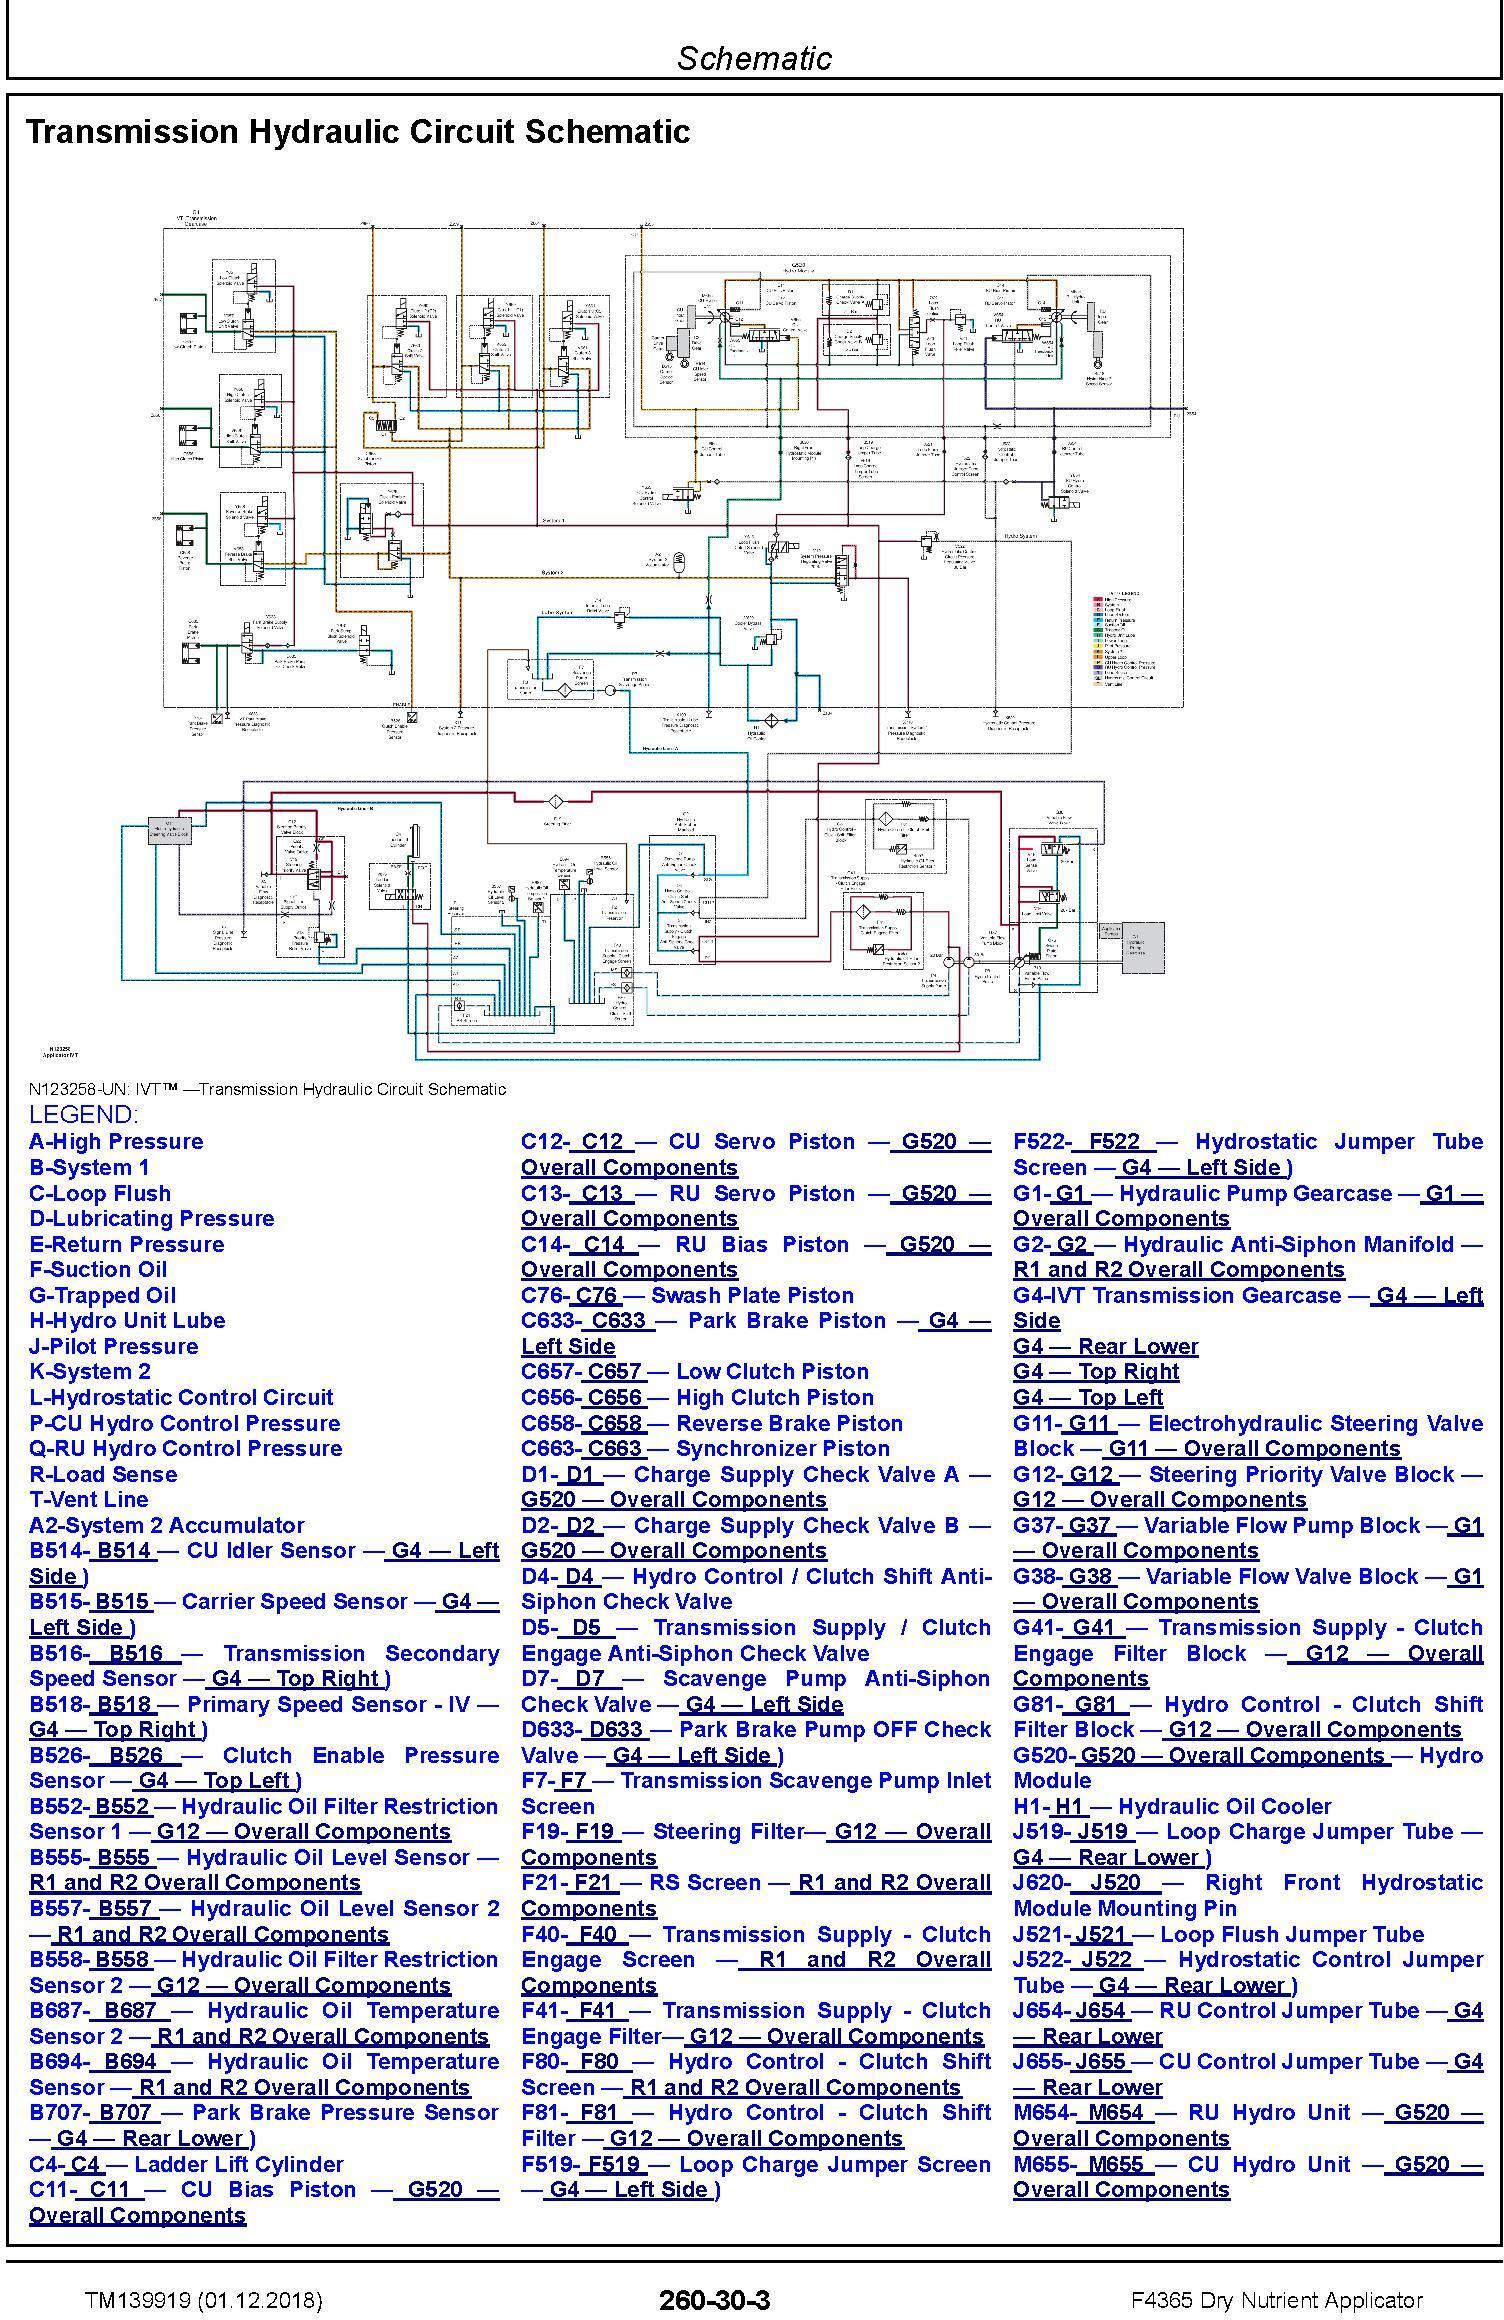 John Deere F4365 Dry Nutrient Applicator Diagnostic Technical Service Manual (TM139919) - 1